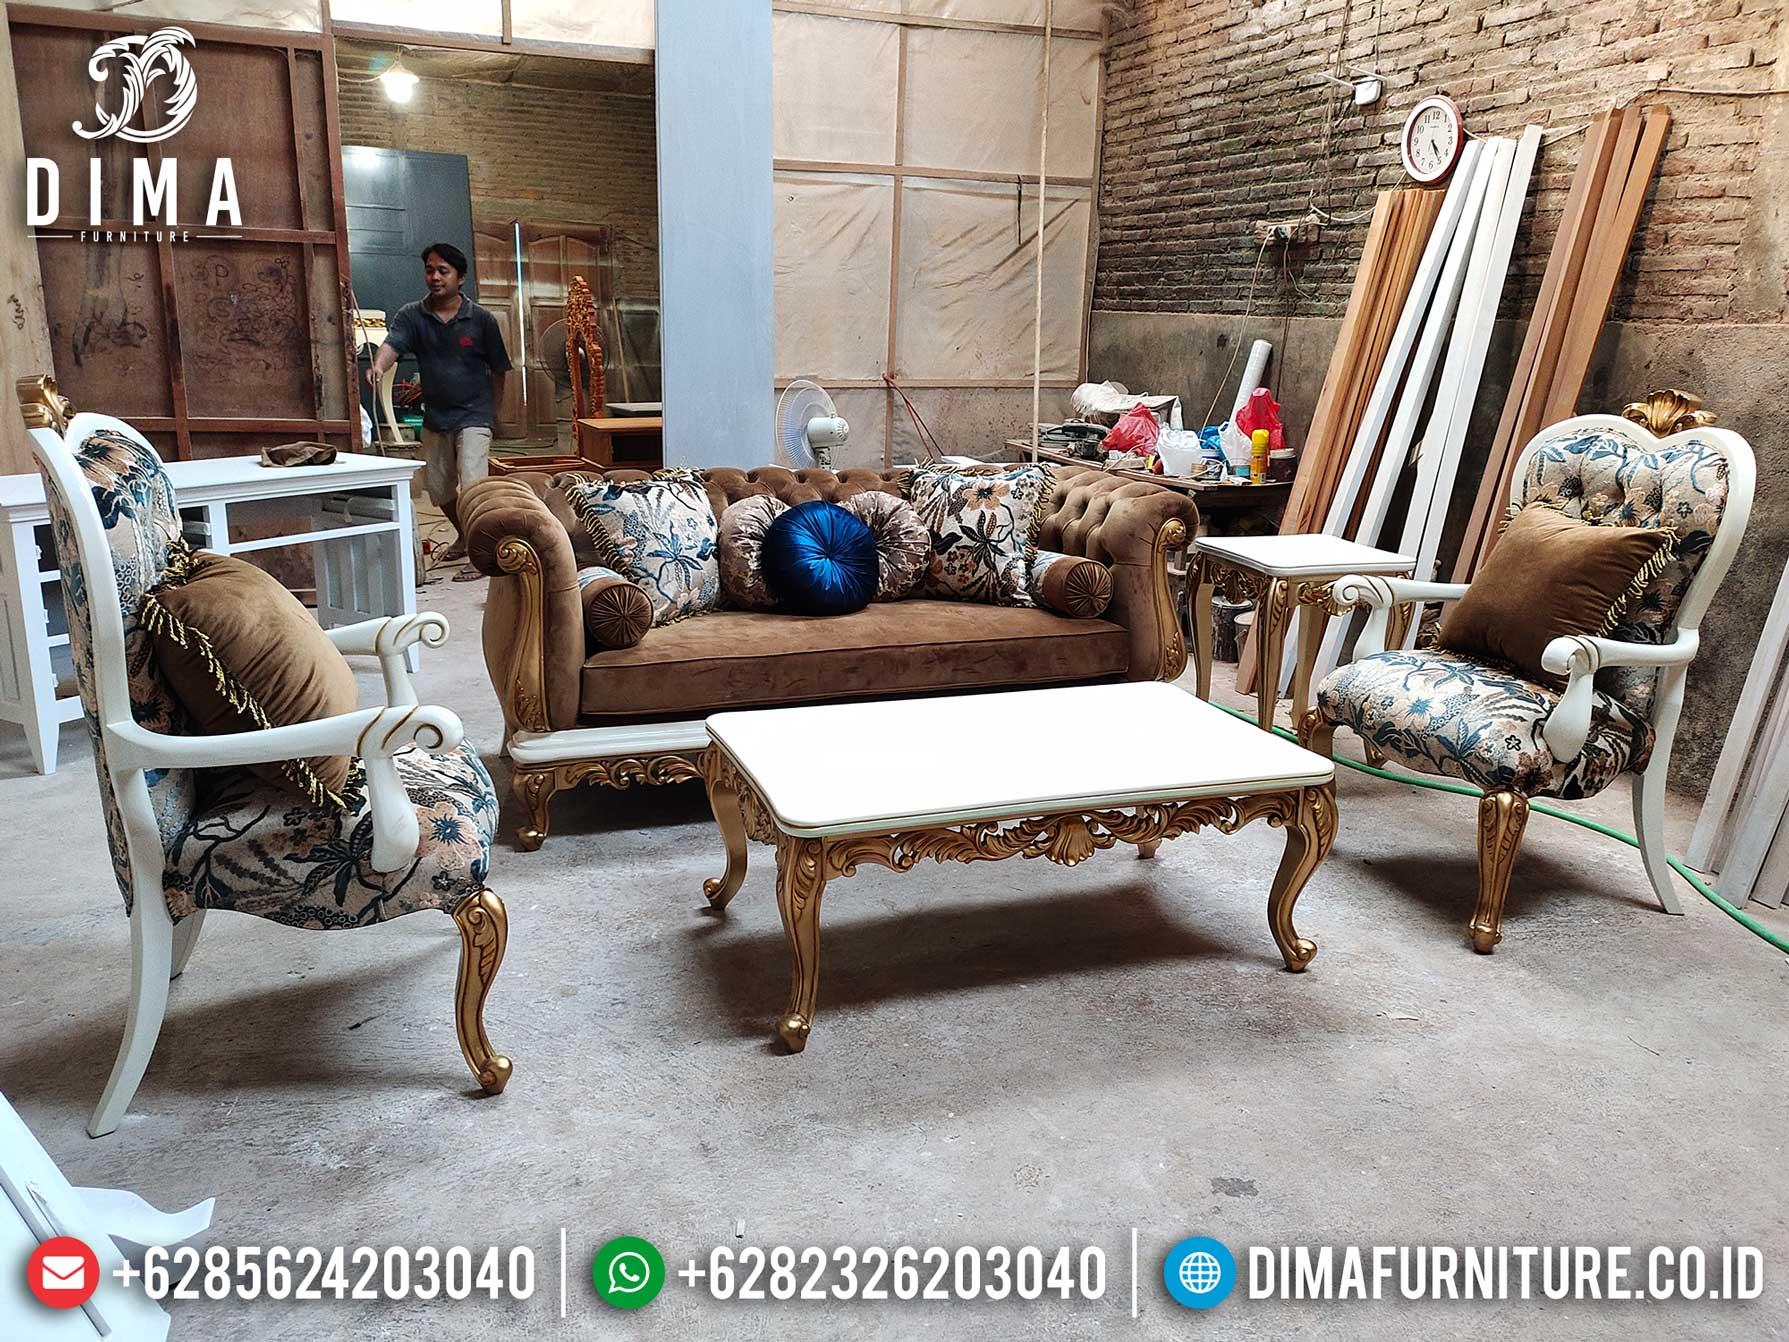 Elegant Set Sofa Tamu Mewah Ukiran Jepara Luxury Classic Best Product TTJ-1274